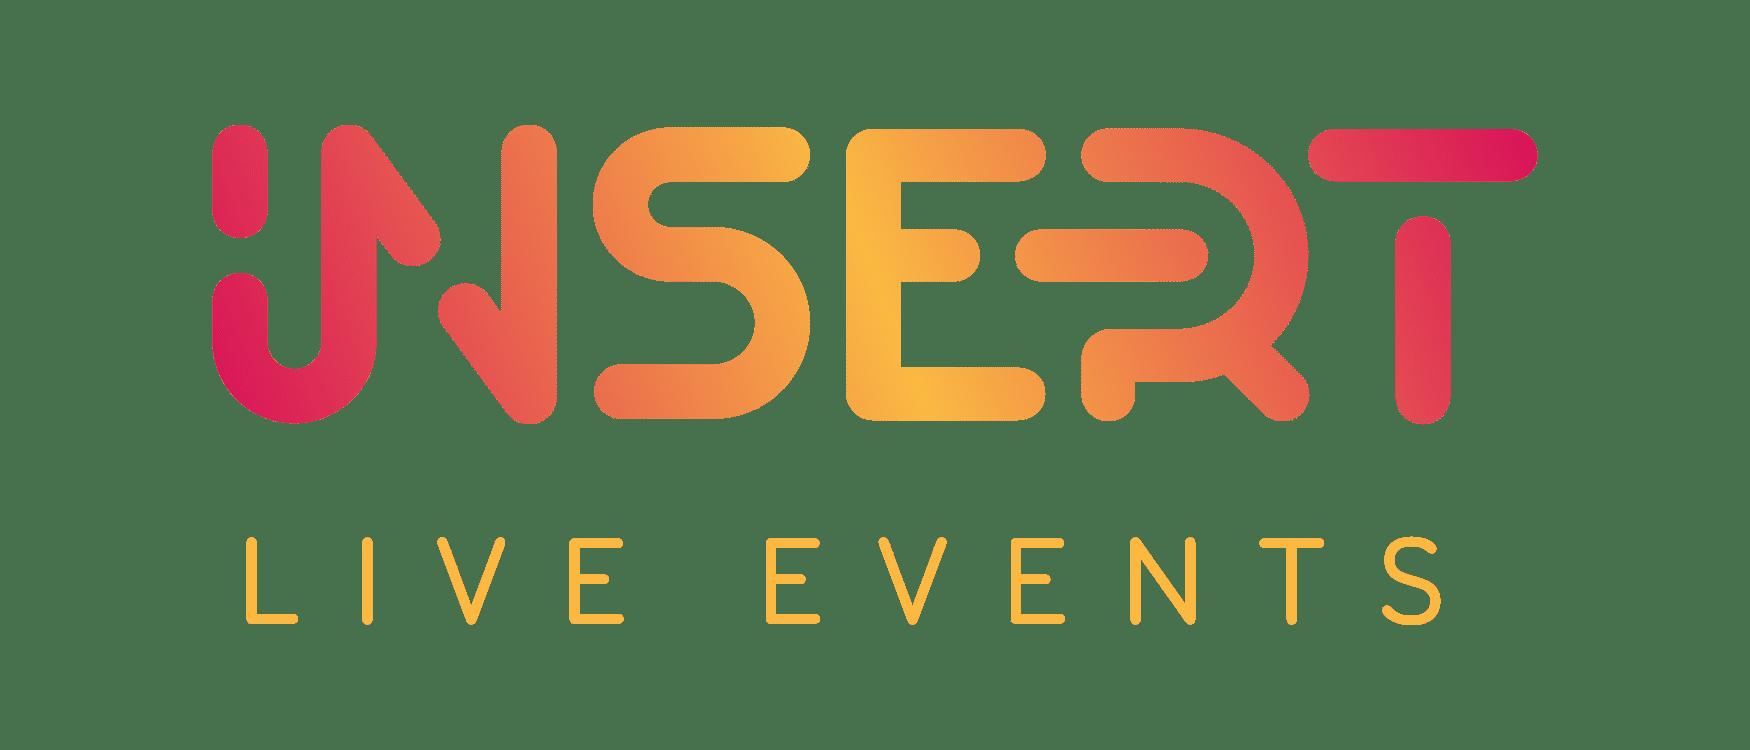 insert live events rebranding, main logo